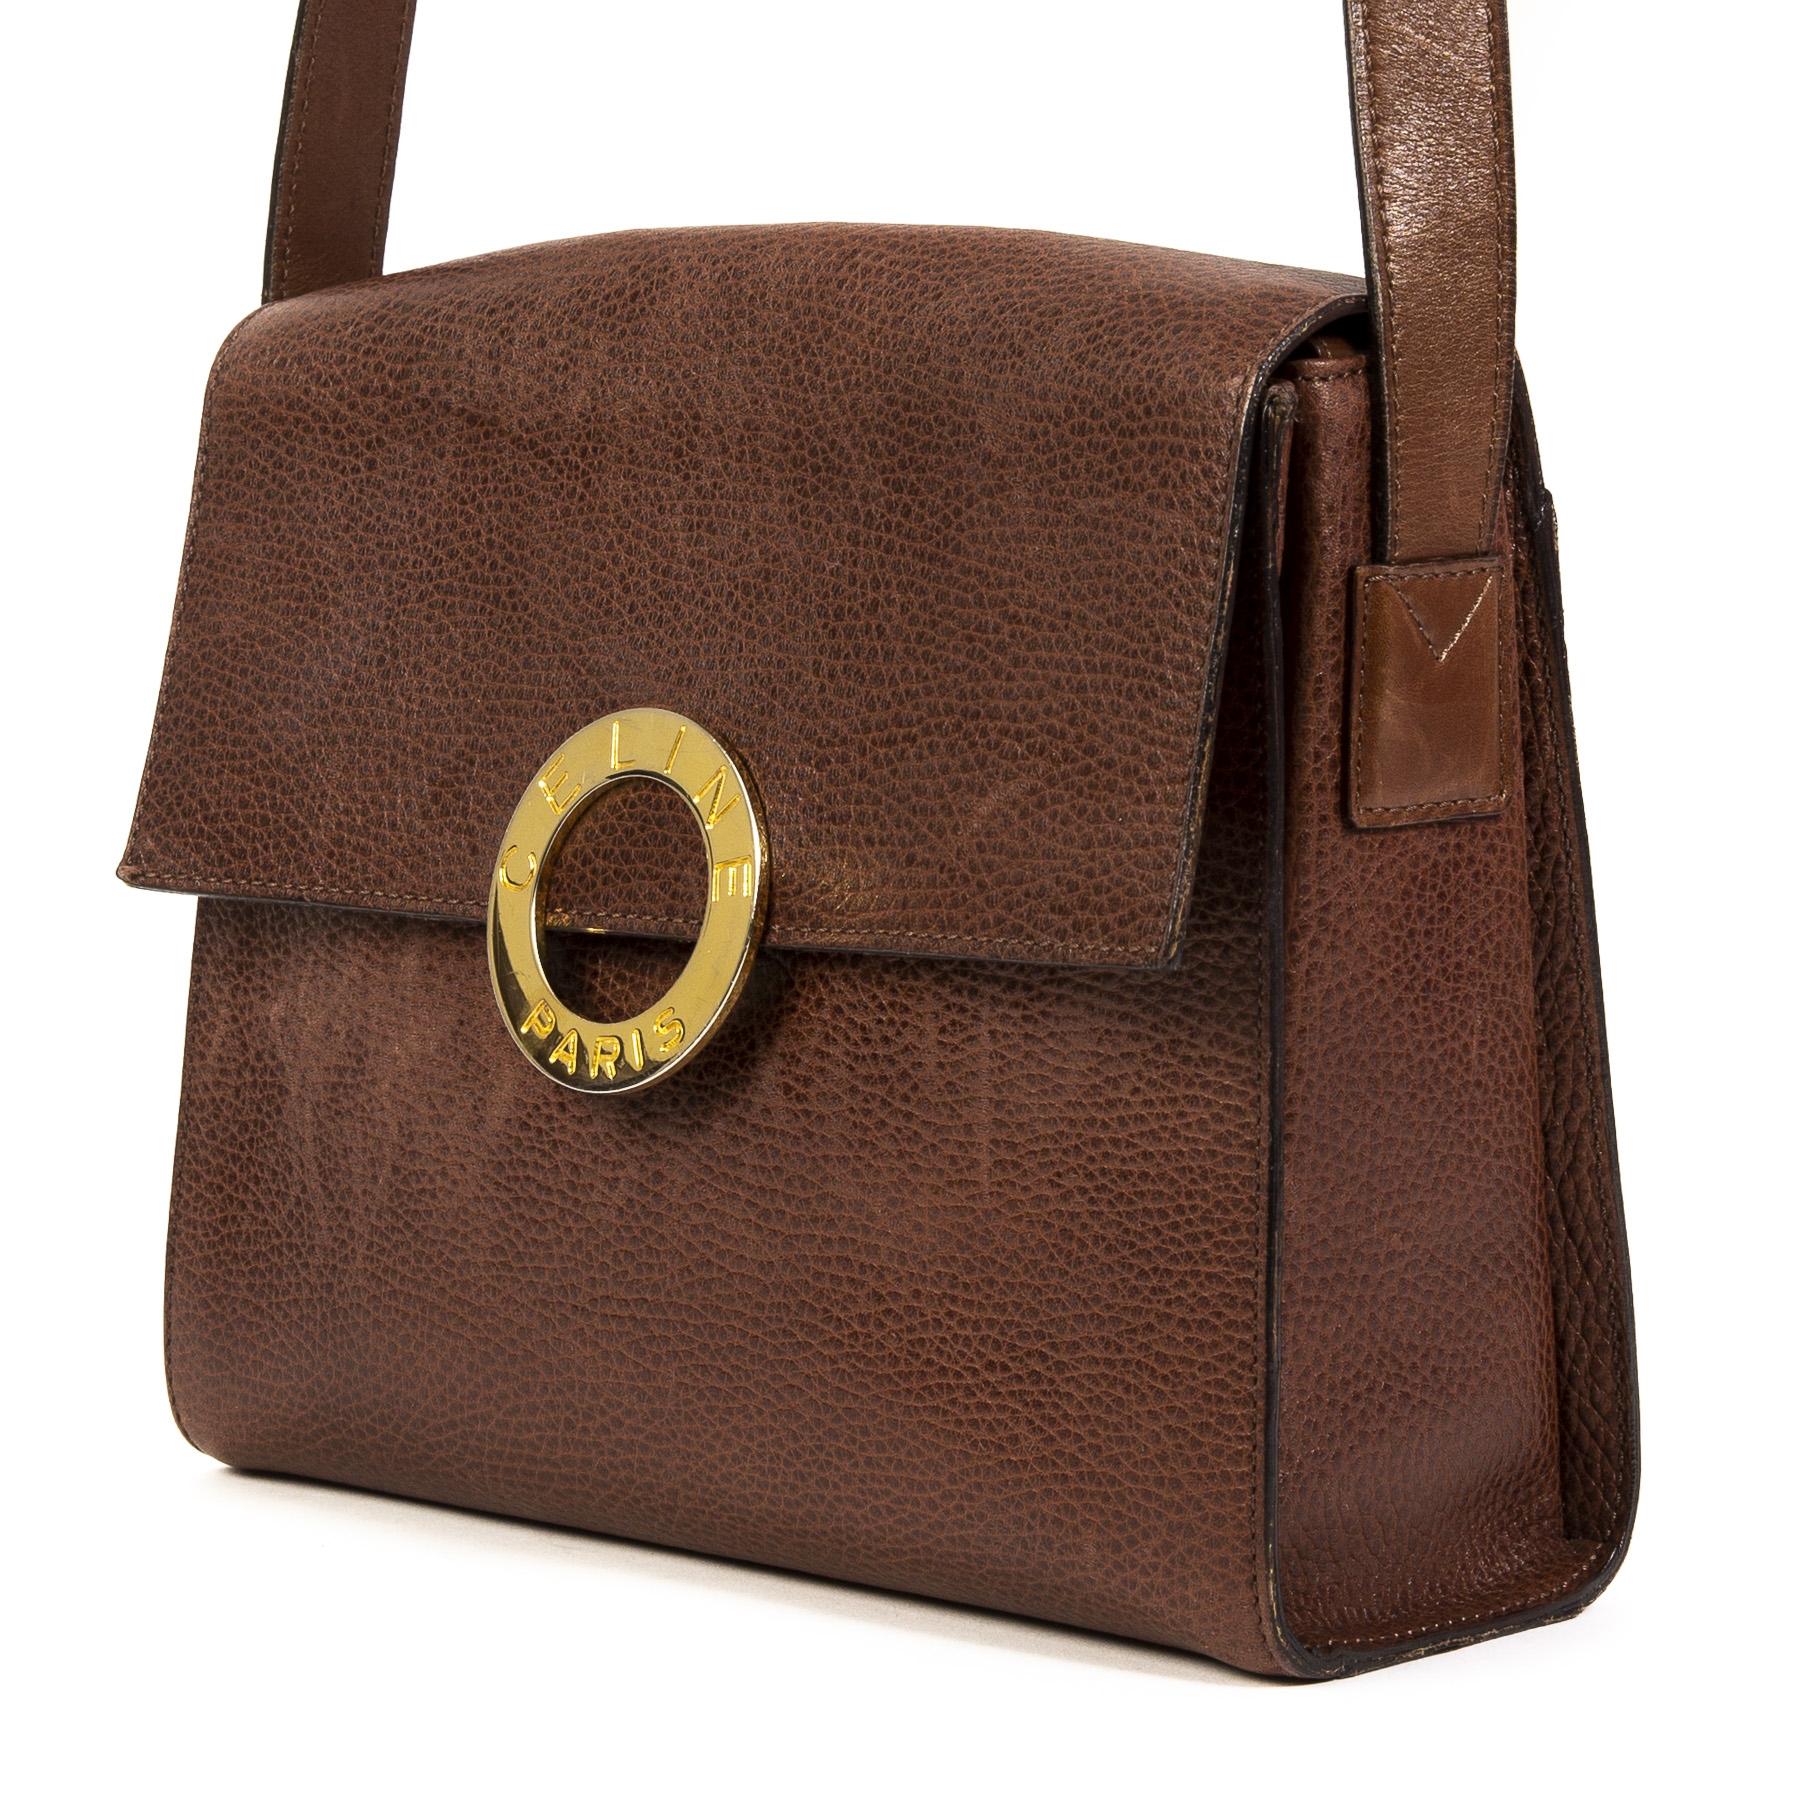 b38f27a0cb7f70 Céline Vintage Golden Circle Crossbody Bag Buy this authentic second-hand  vintage Céline Vintage Golden Circle Crossbody Bag at online webshop